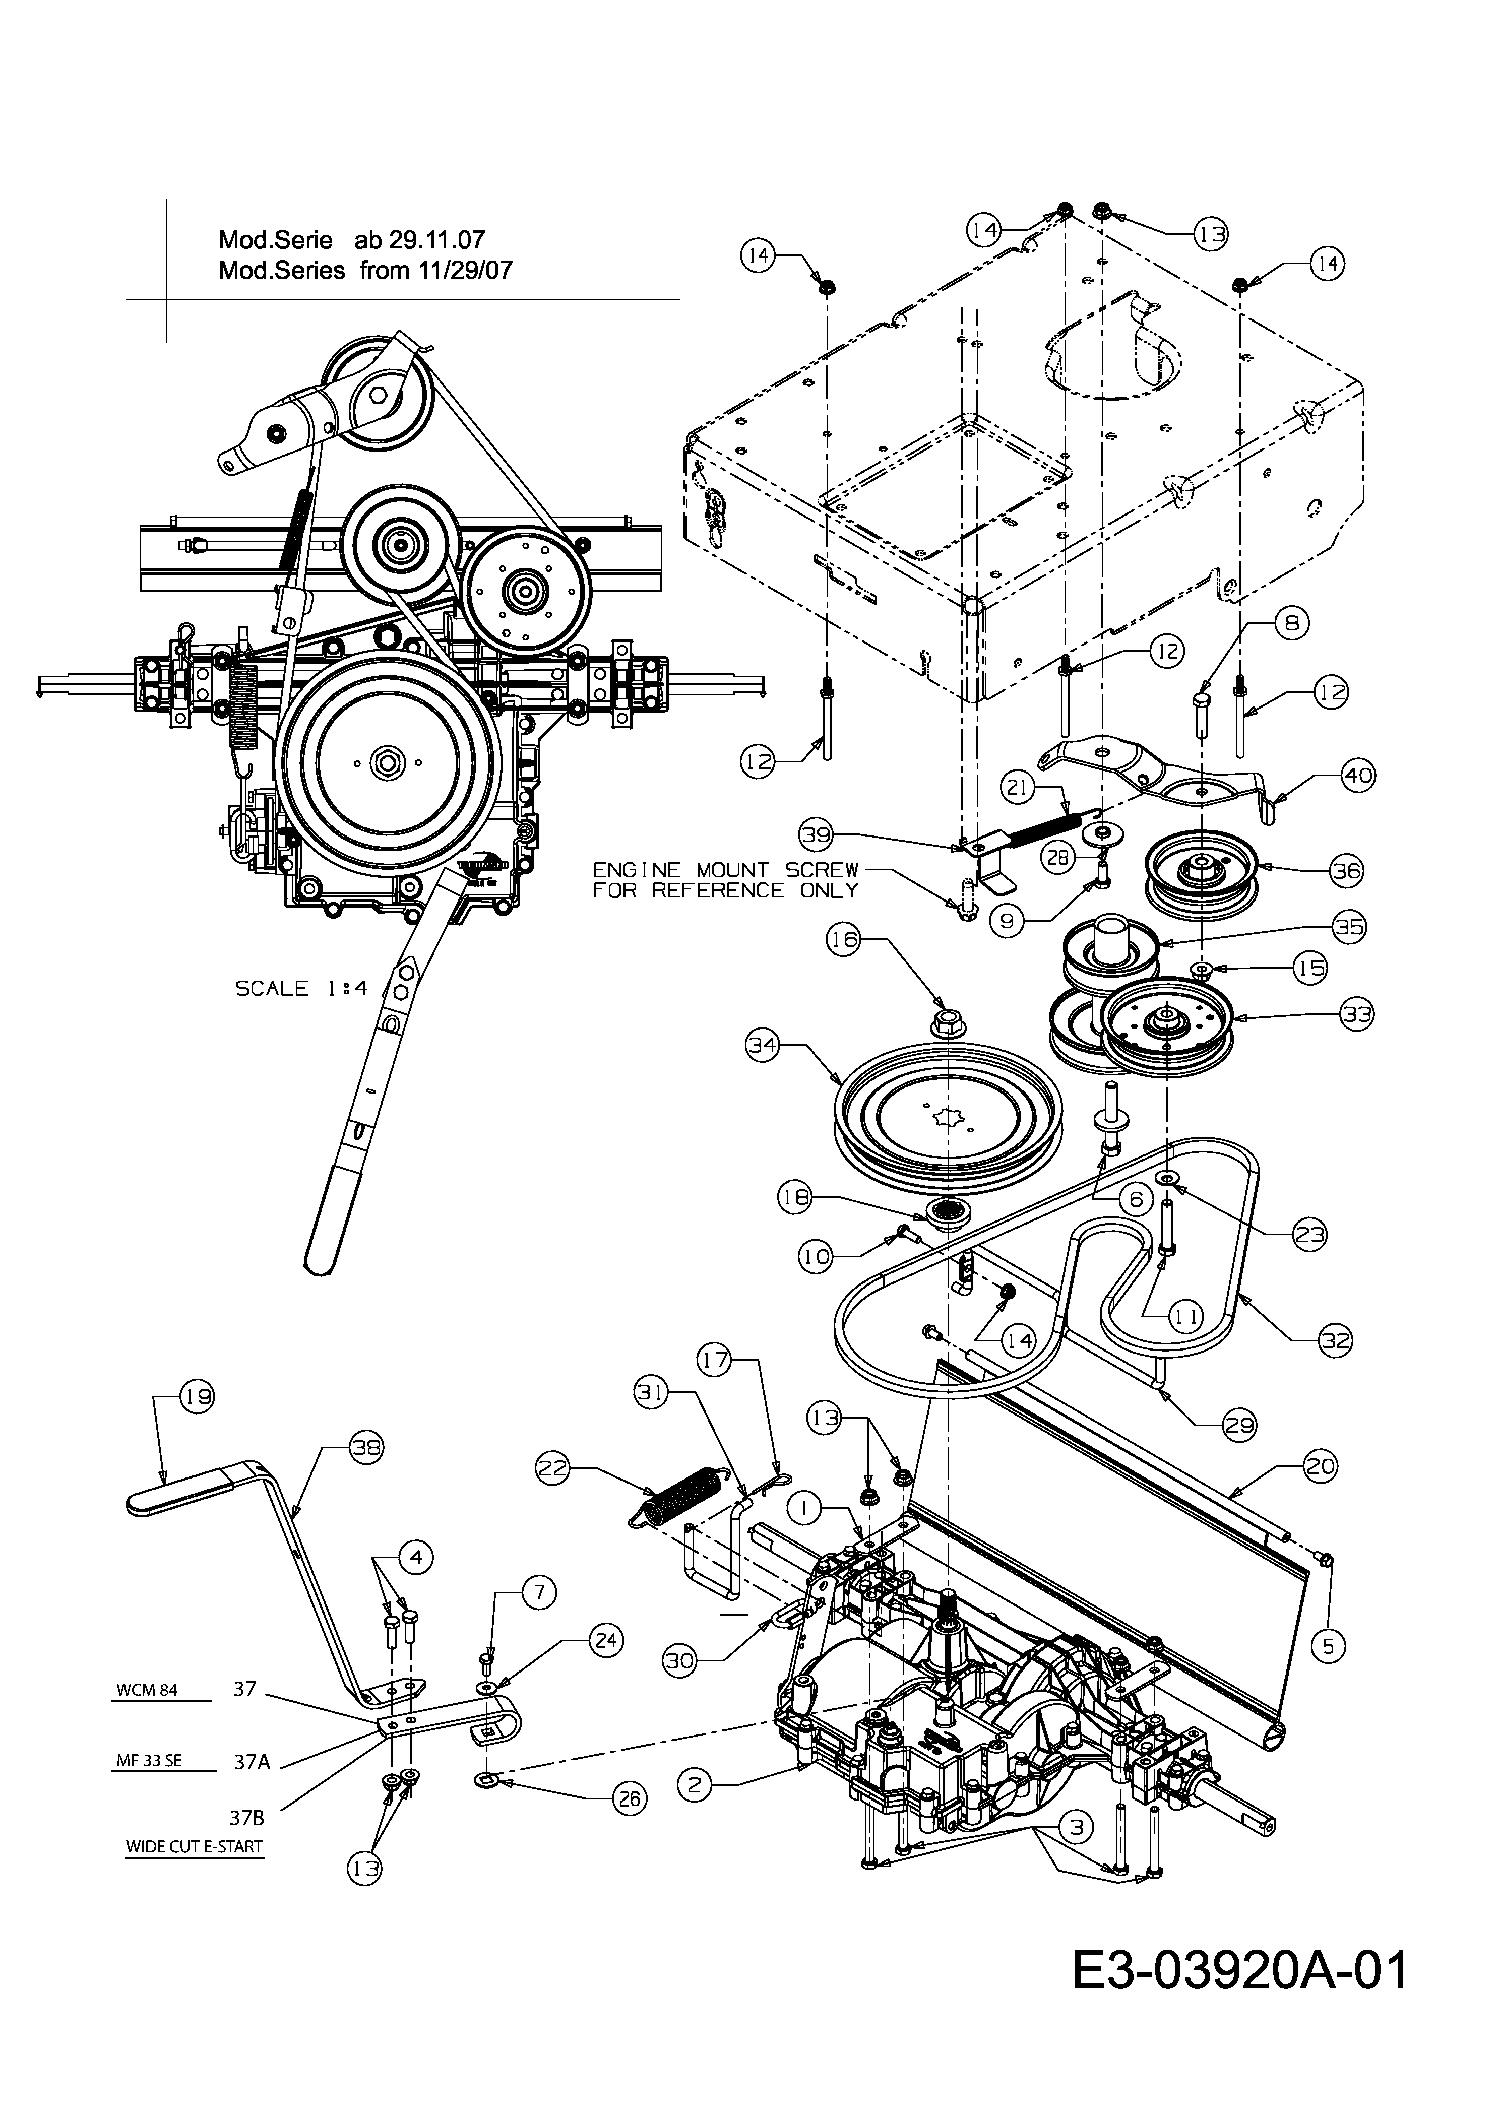 mtd wcm 84 getriebe  motorkeilriemenscheibe 12a